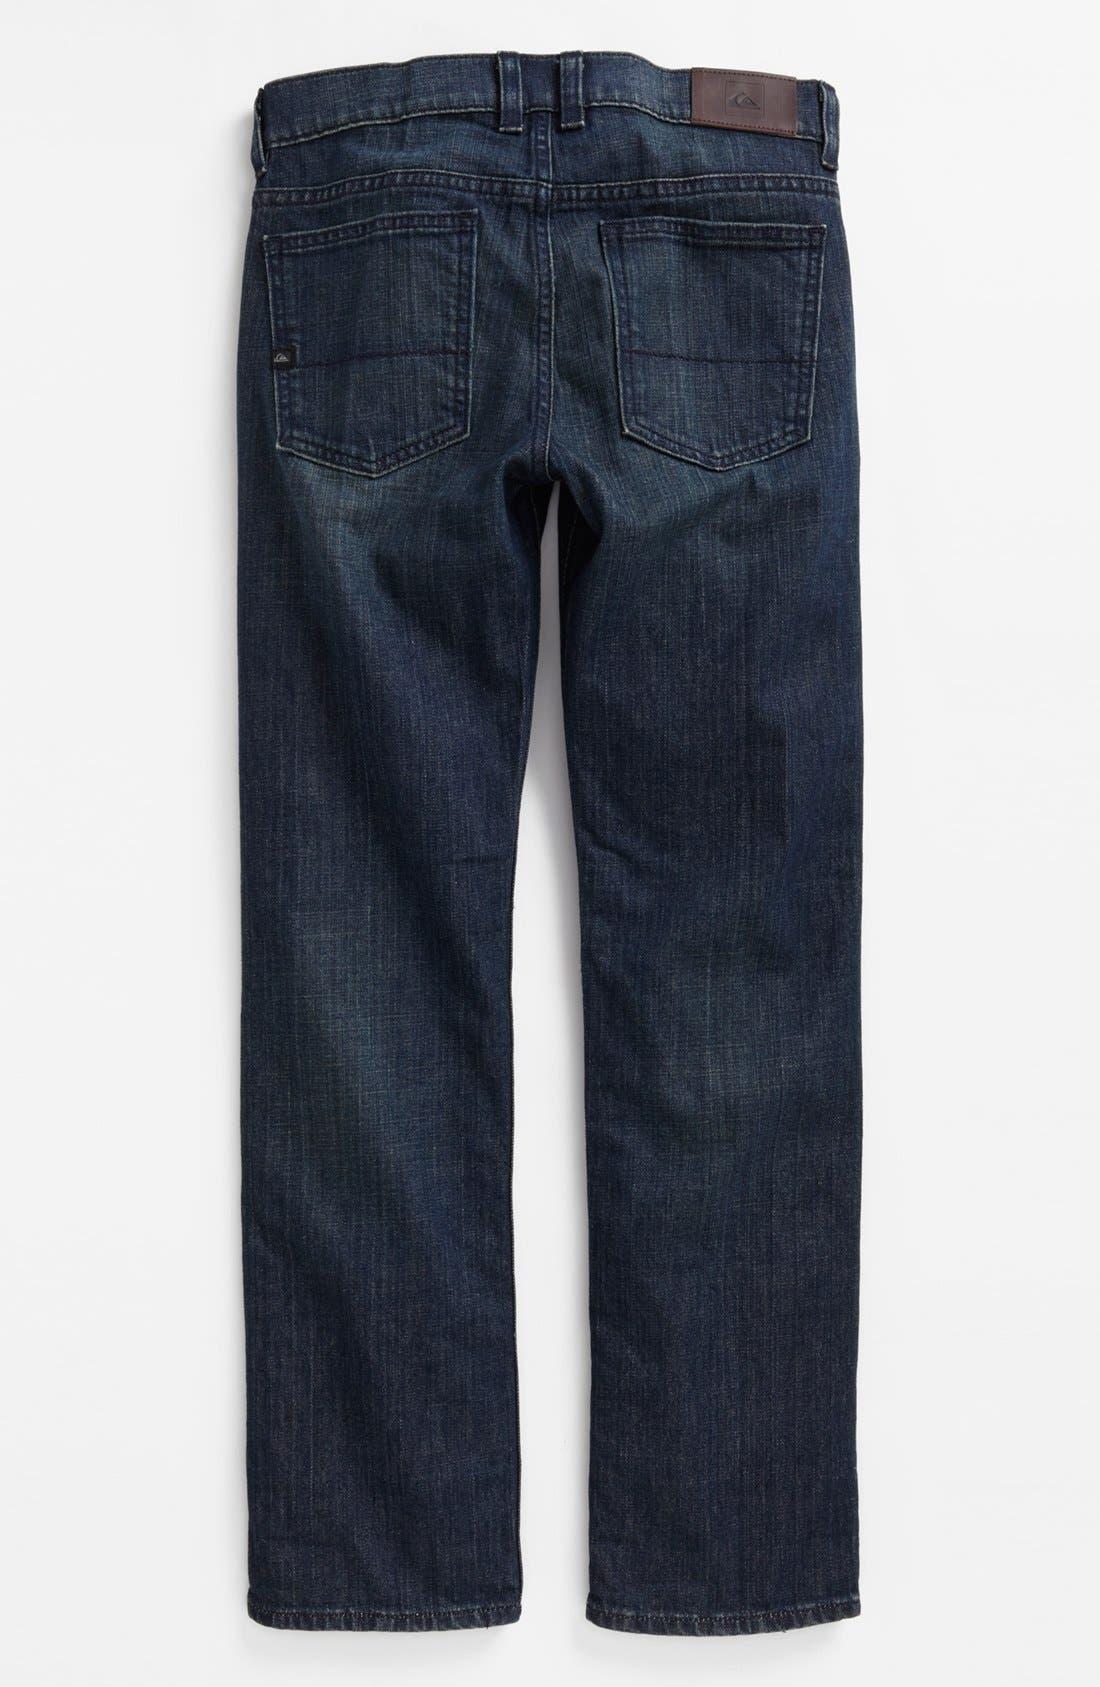 Main Image - Quiksilver 'Revolver' Straight Leg Jeans (Big Boys)